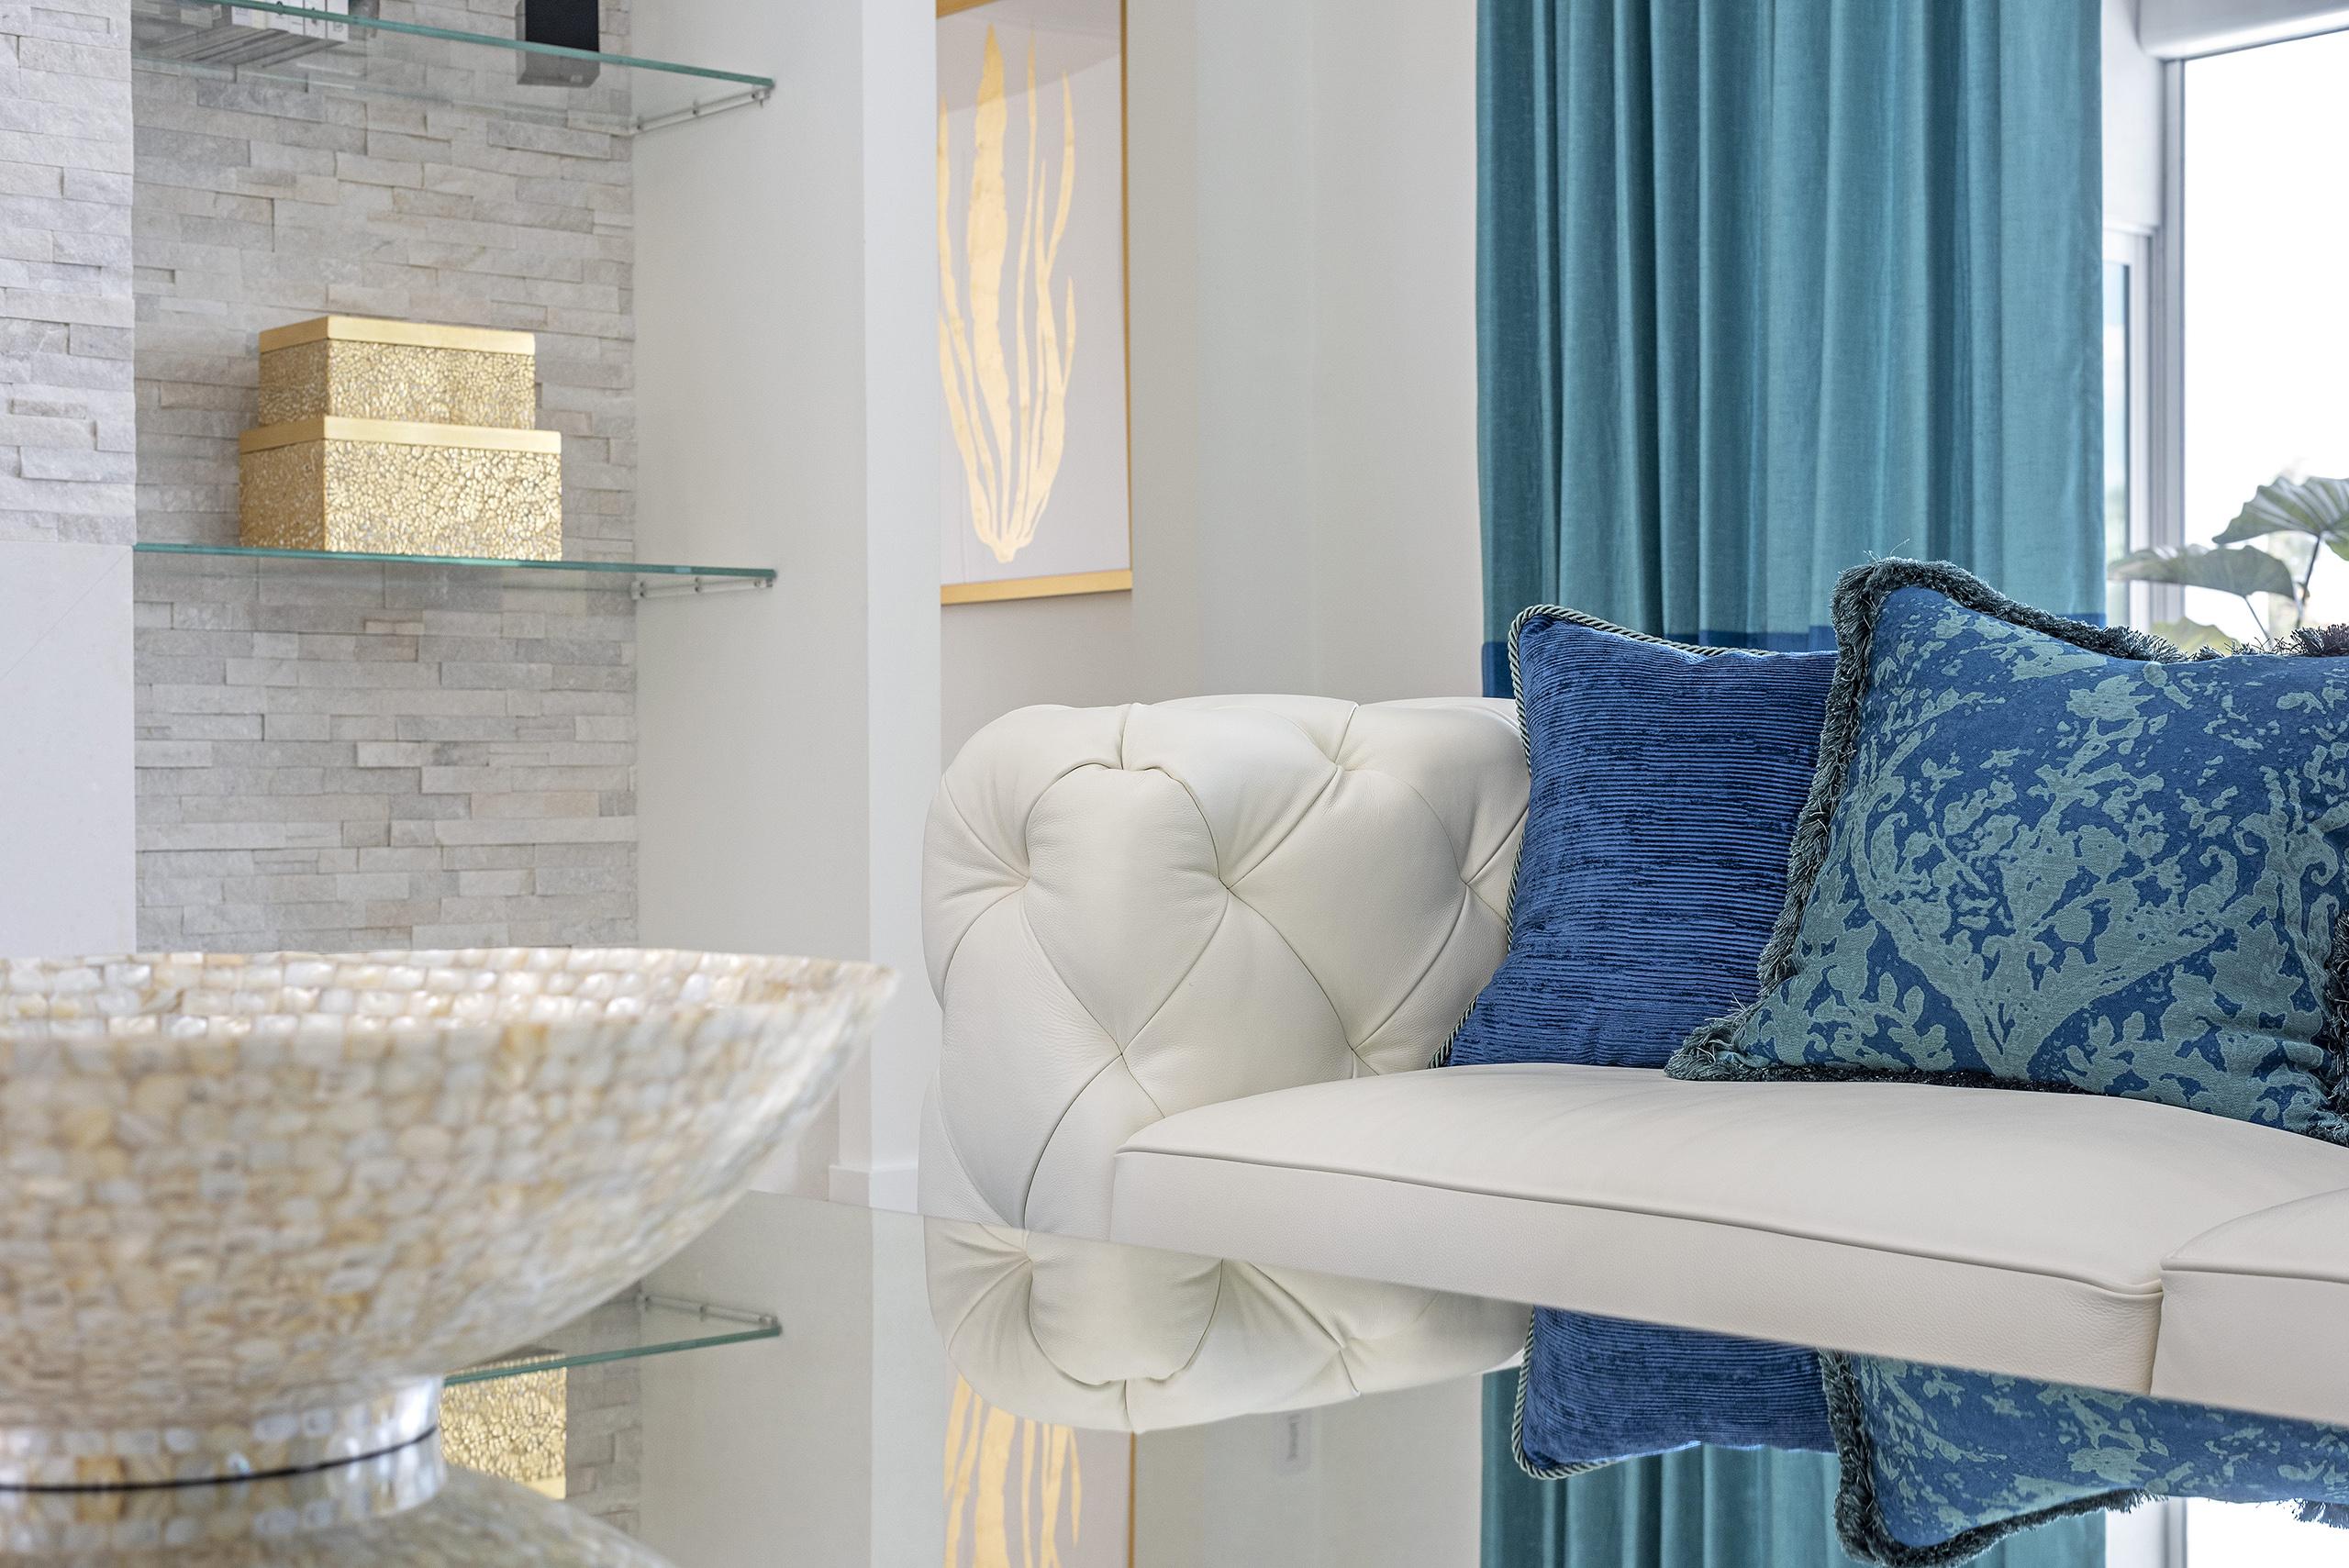 Linda Mixon White Couch Vignette